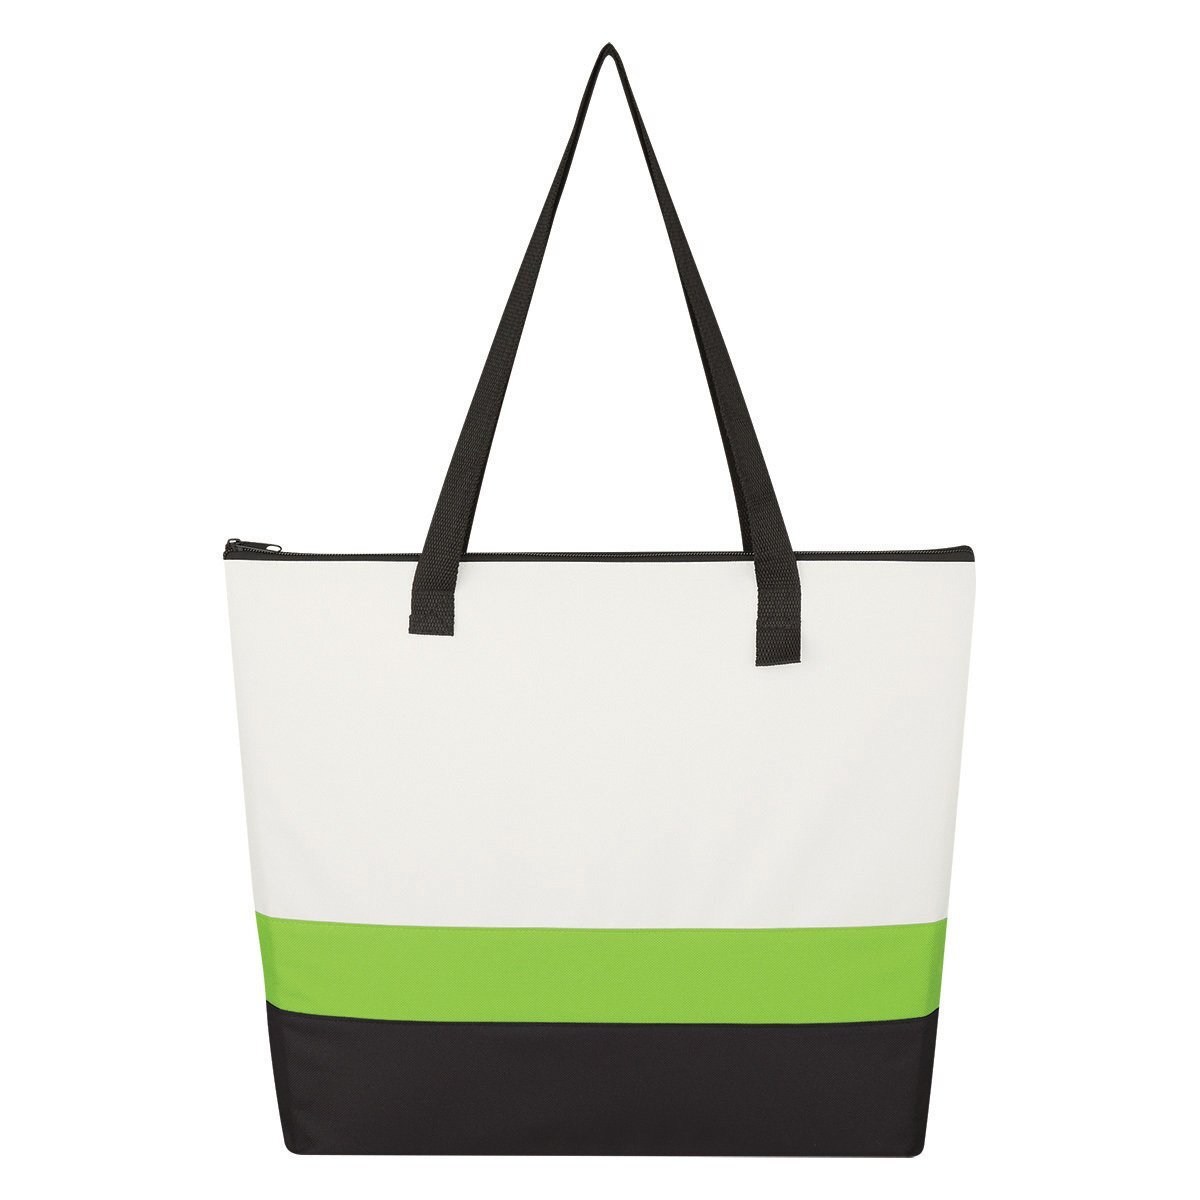 Affinity 600D Bold Stripe Tote Bag